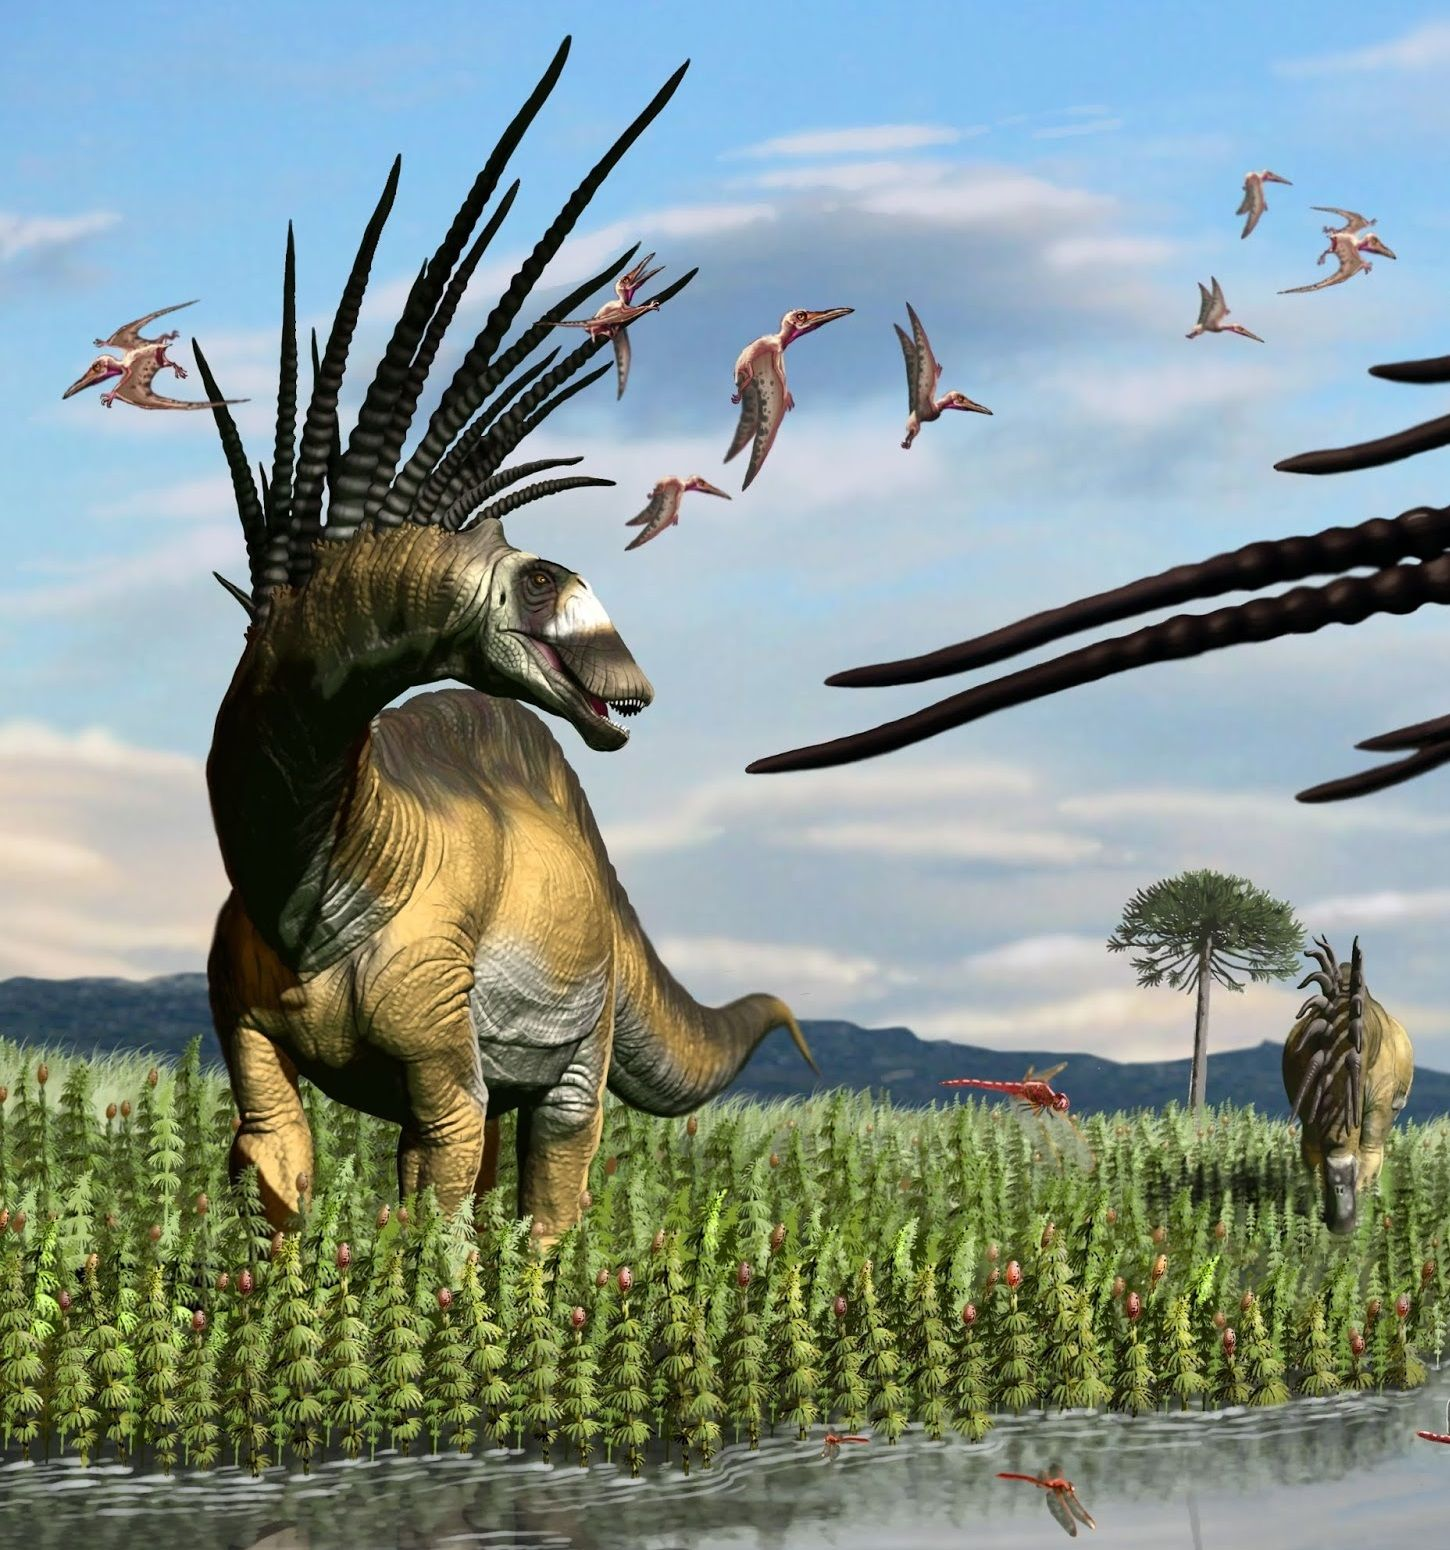 [Paleontology • 2019] Bajadasaurus pronuspinax • A New